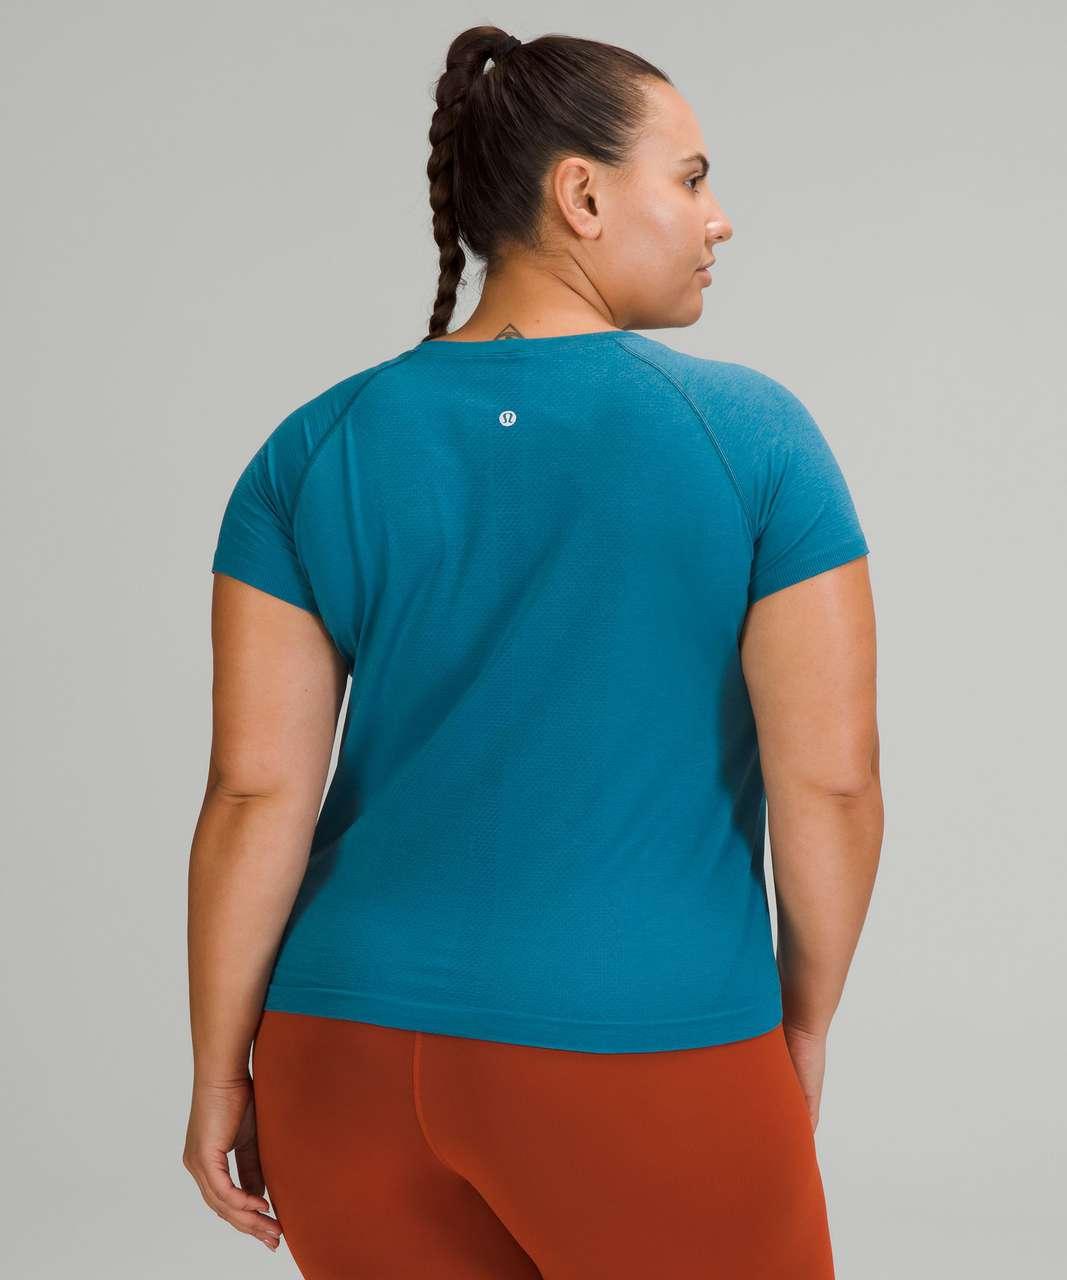 Lululemon Swiftly Tech Short Sleeve Shirt 2.0 *Race Length - Capri / Capture Blue